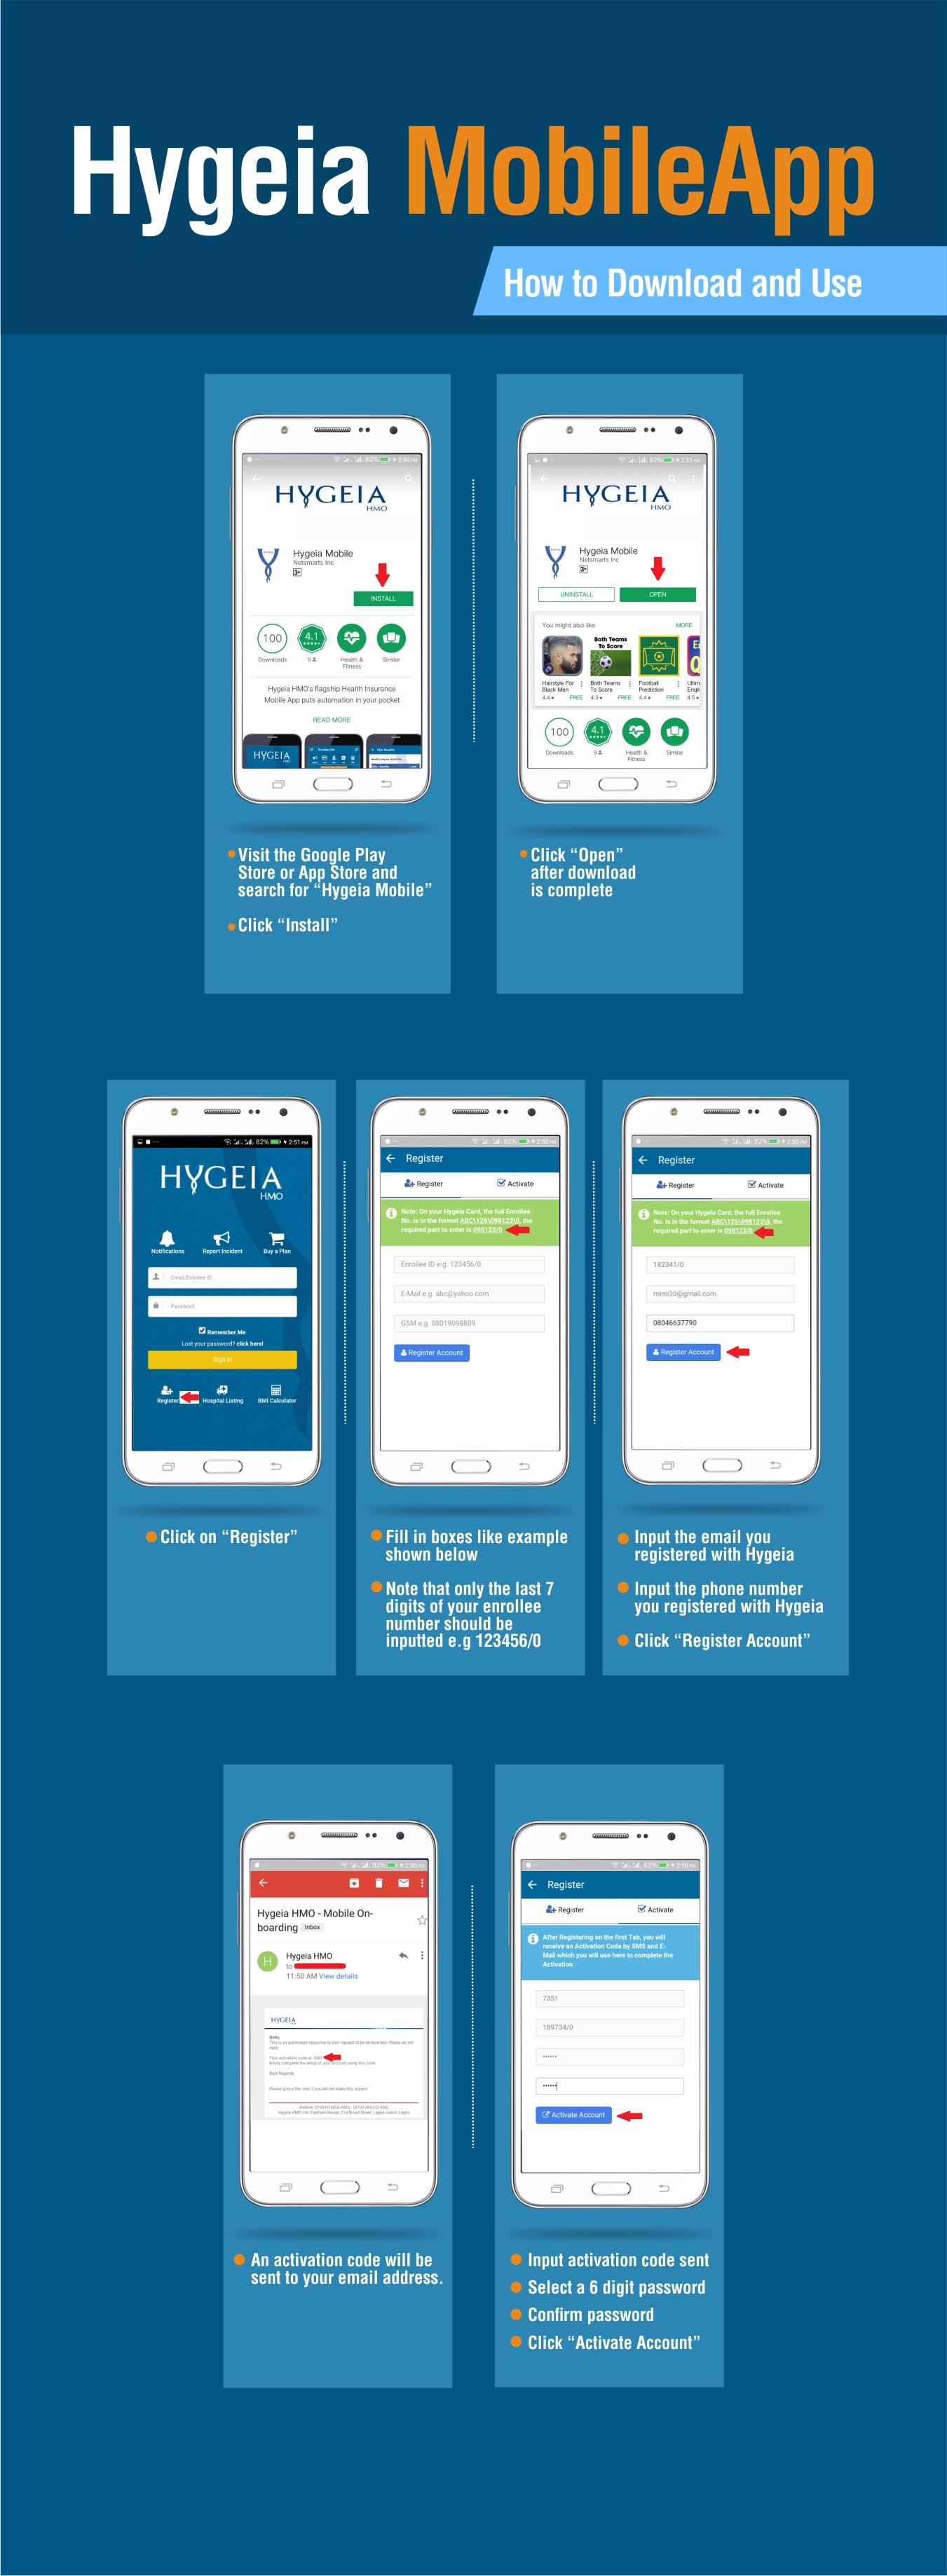 Hygeia Mobile App